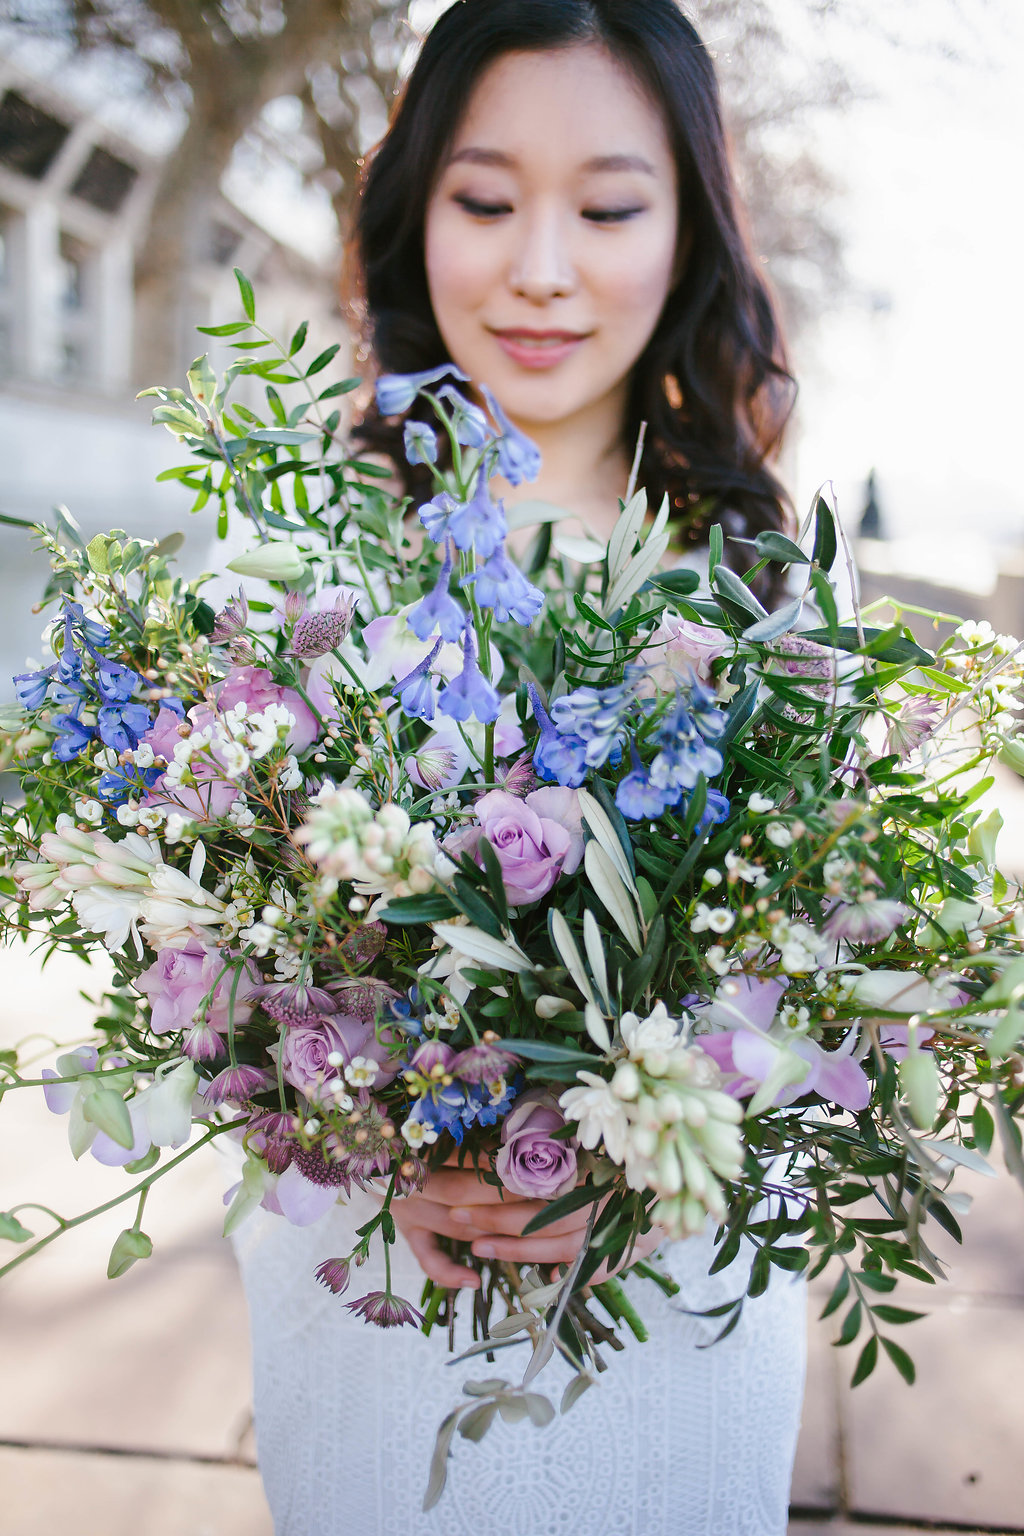 Nina Pang Photography - City Bride - London wedding - City wedding - Chinese wedding 21